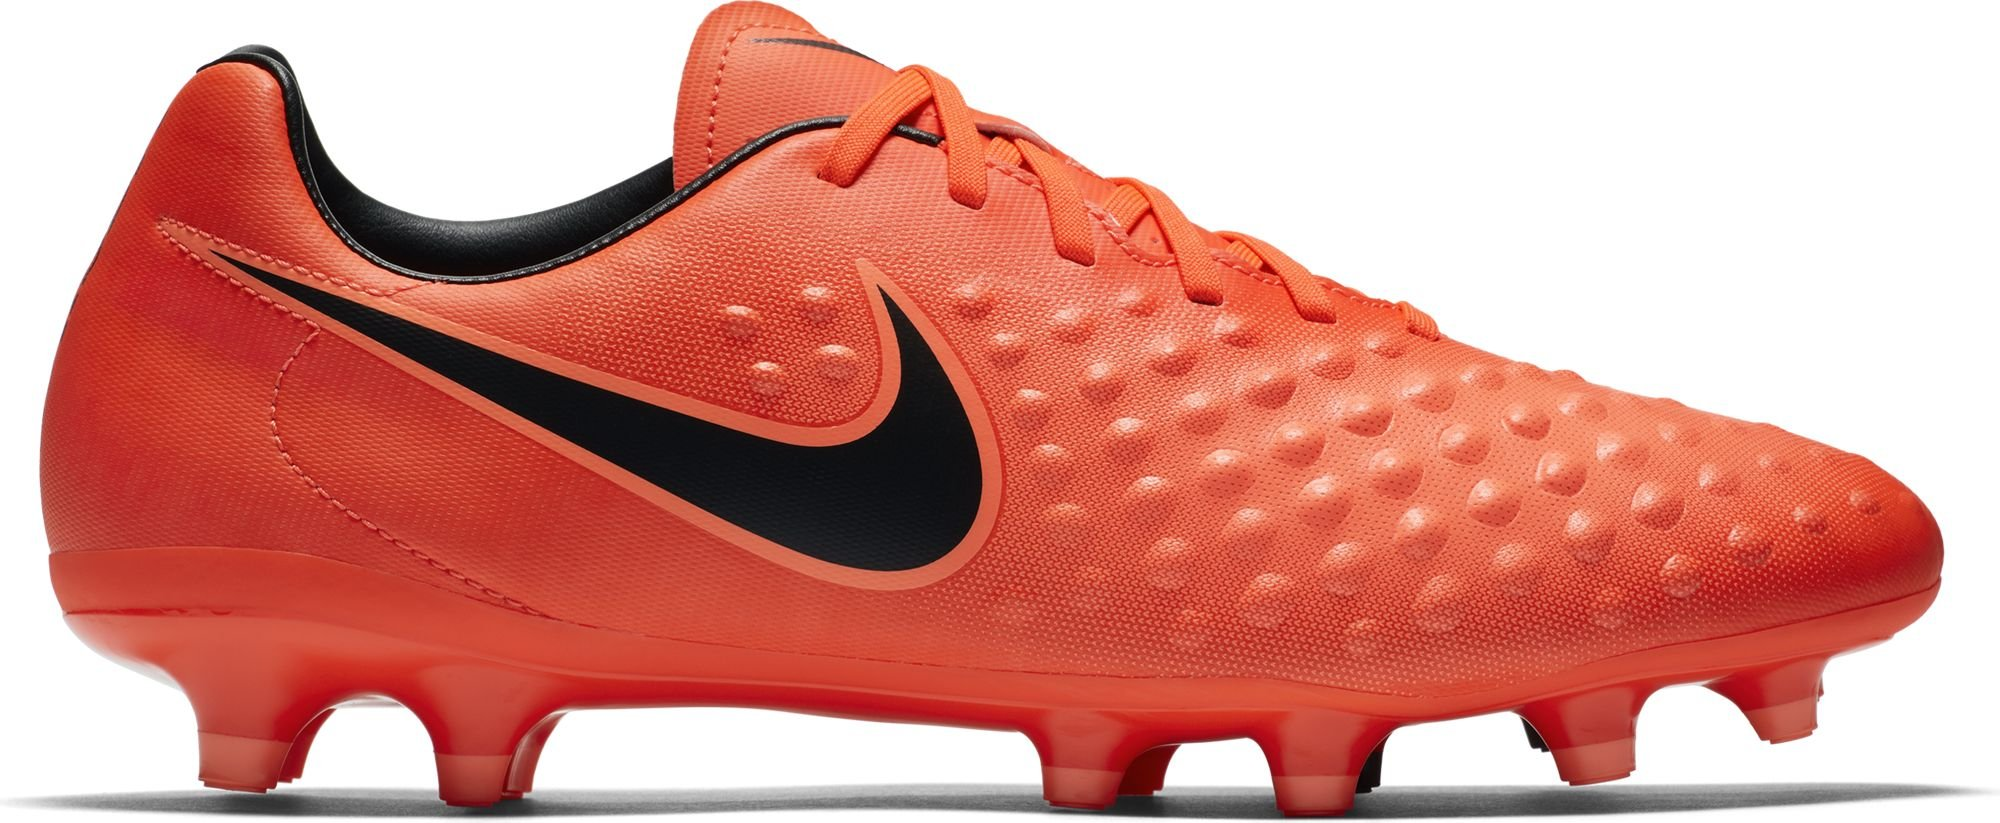 c0f0c936fe17 Galleon - NIKE Magista Onda II FG Mens Football Boots 844411 Soccer Cleats  (US 8